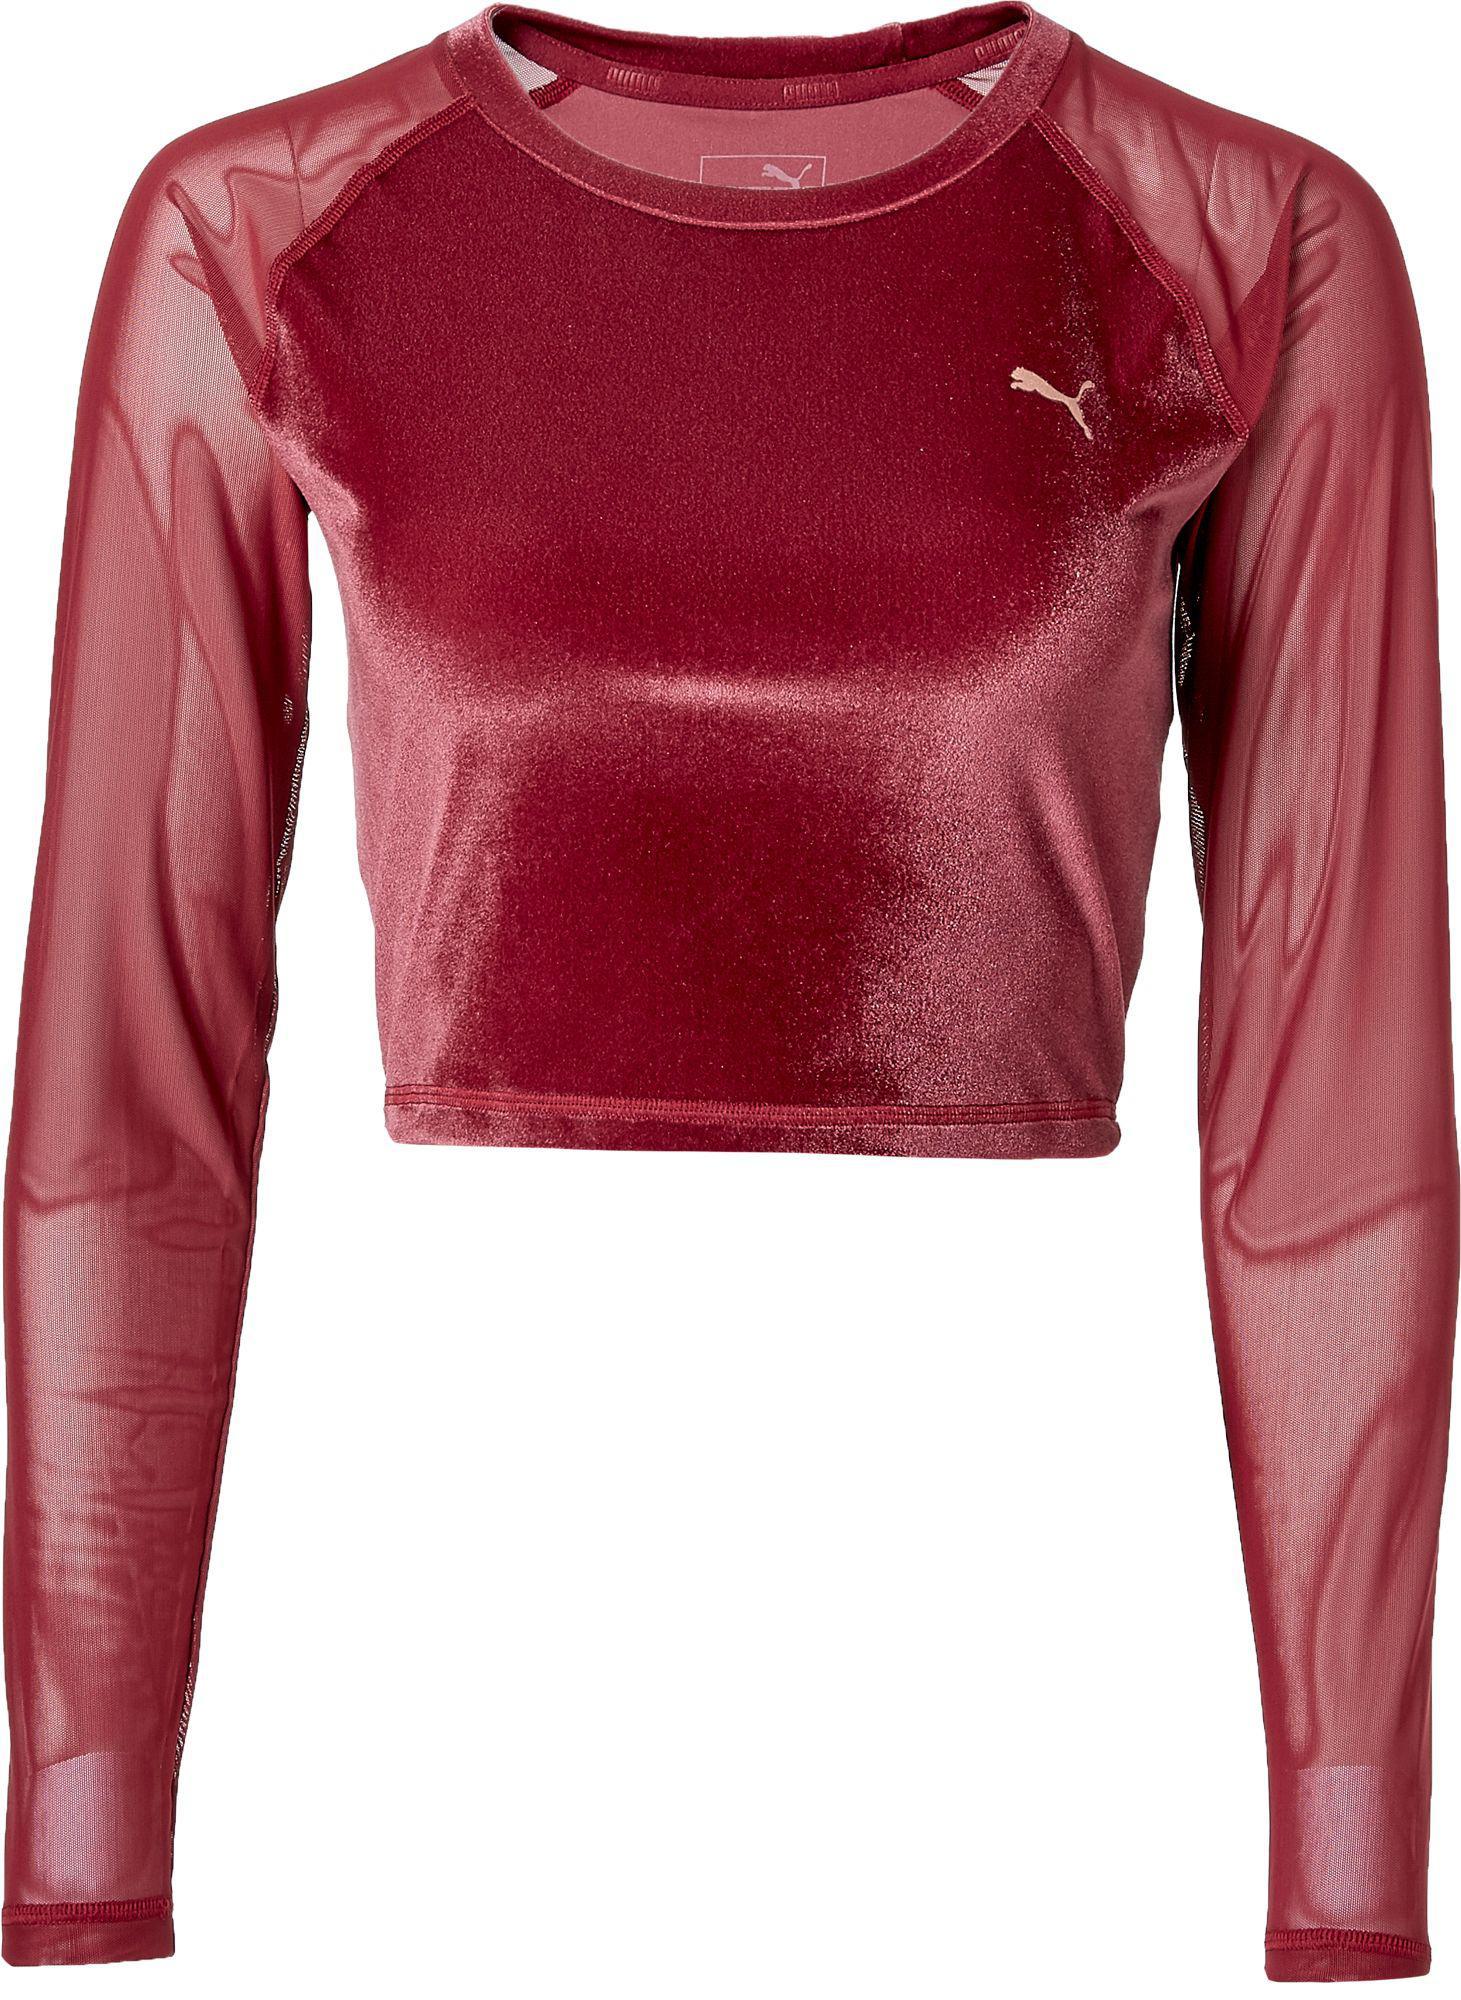 2f6d64f87f9b63 Lyst - PUMA Explosive Velvet Crop Top in Red